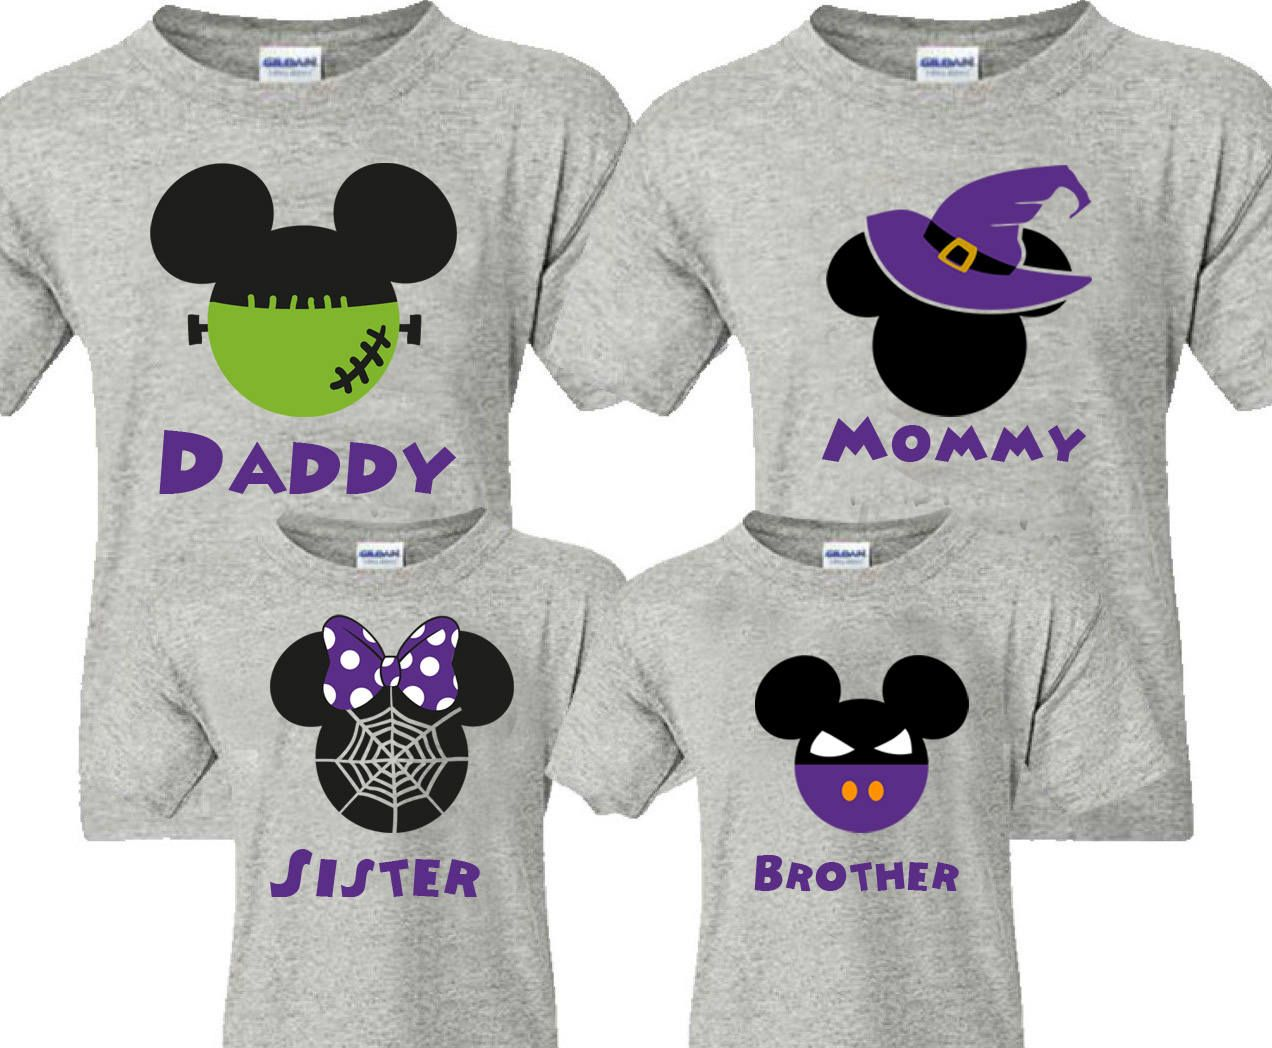 Disney Halloween Shirts For Kids.Pin On Custom Disney Shirts